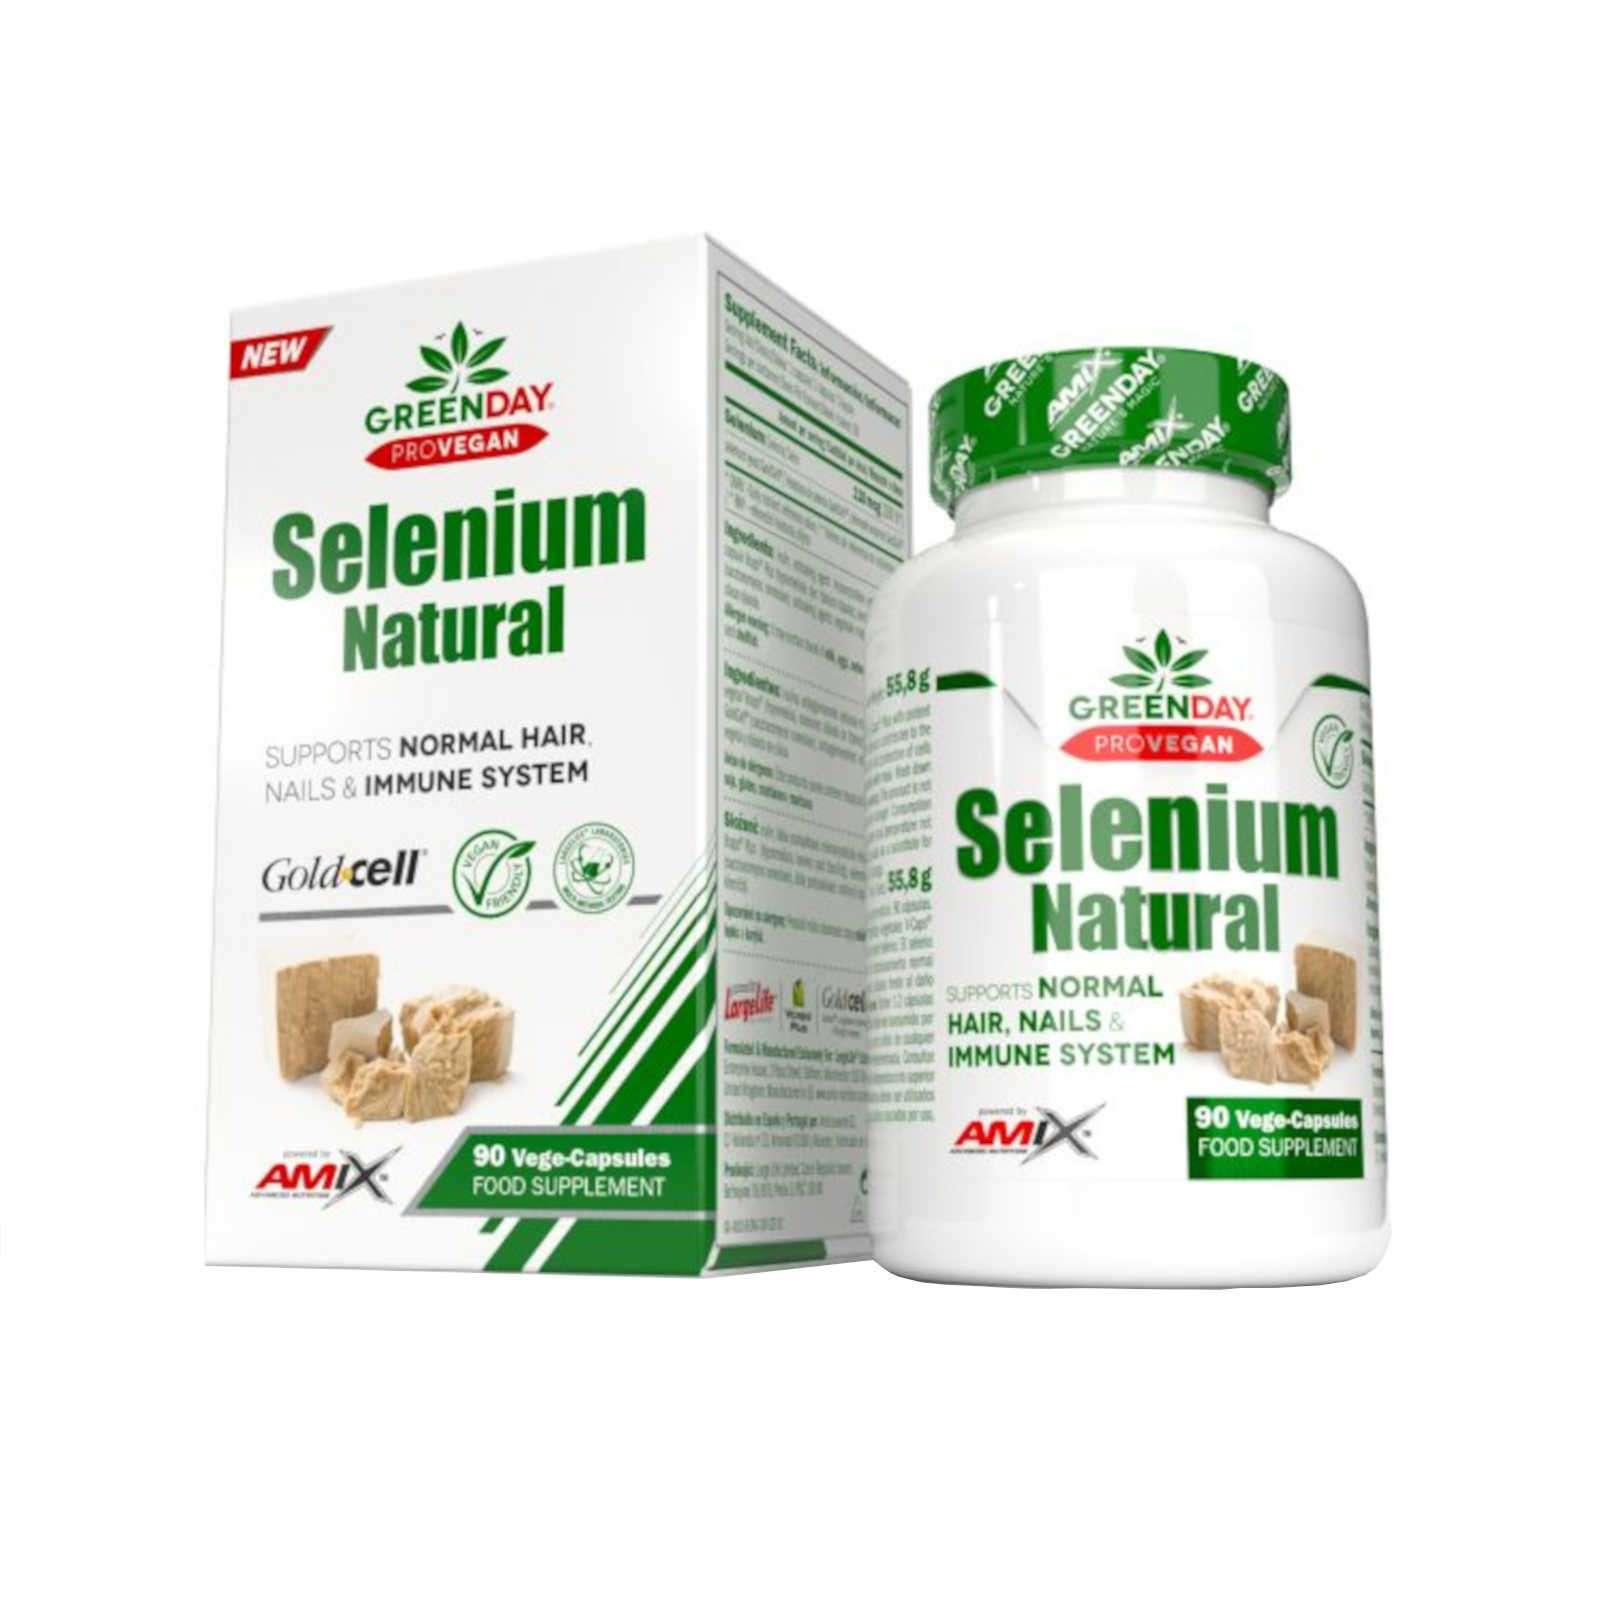 SELENIUM NATURAL - 90 veg caps